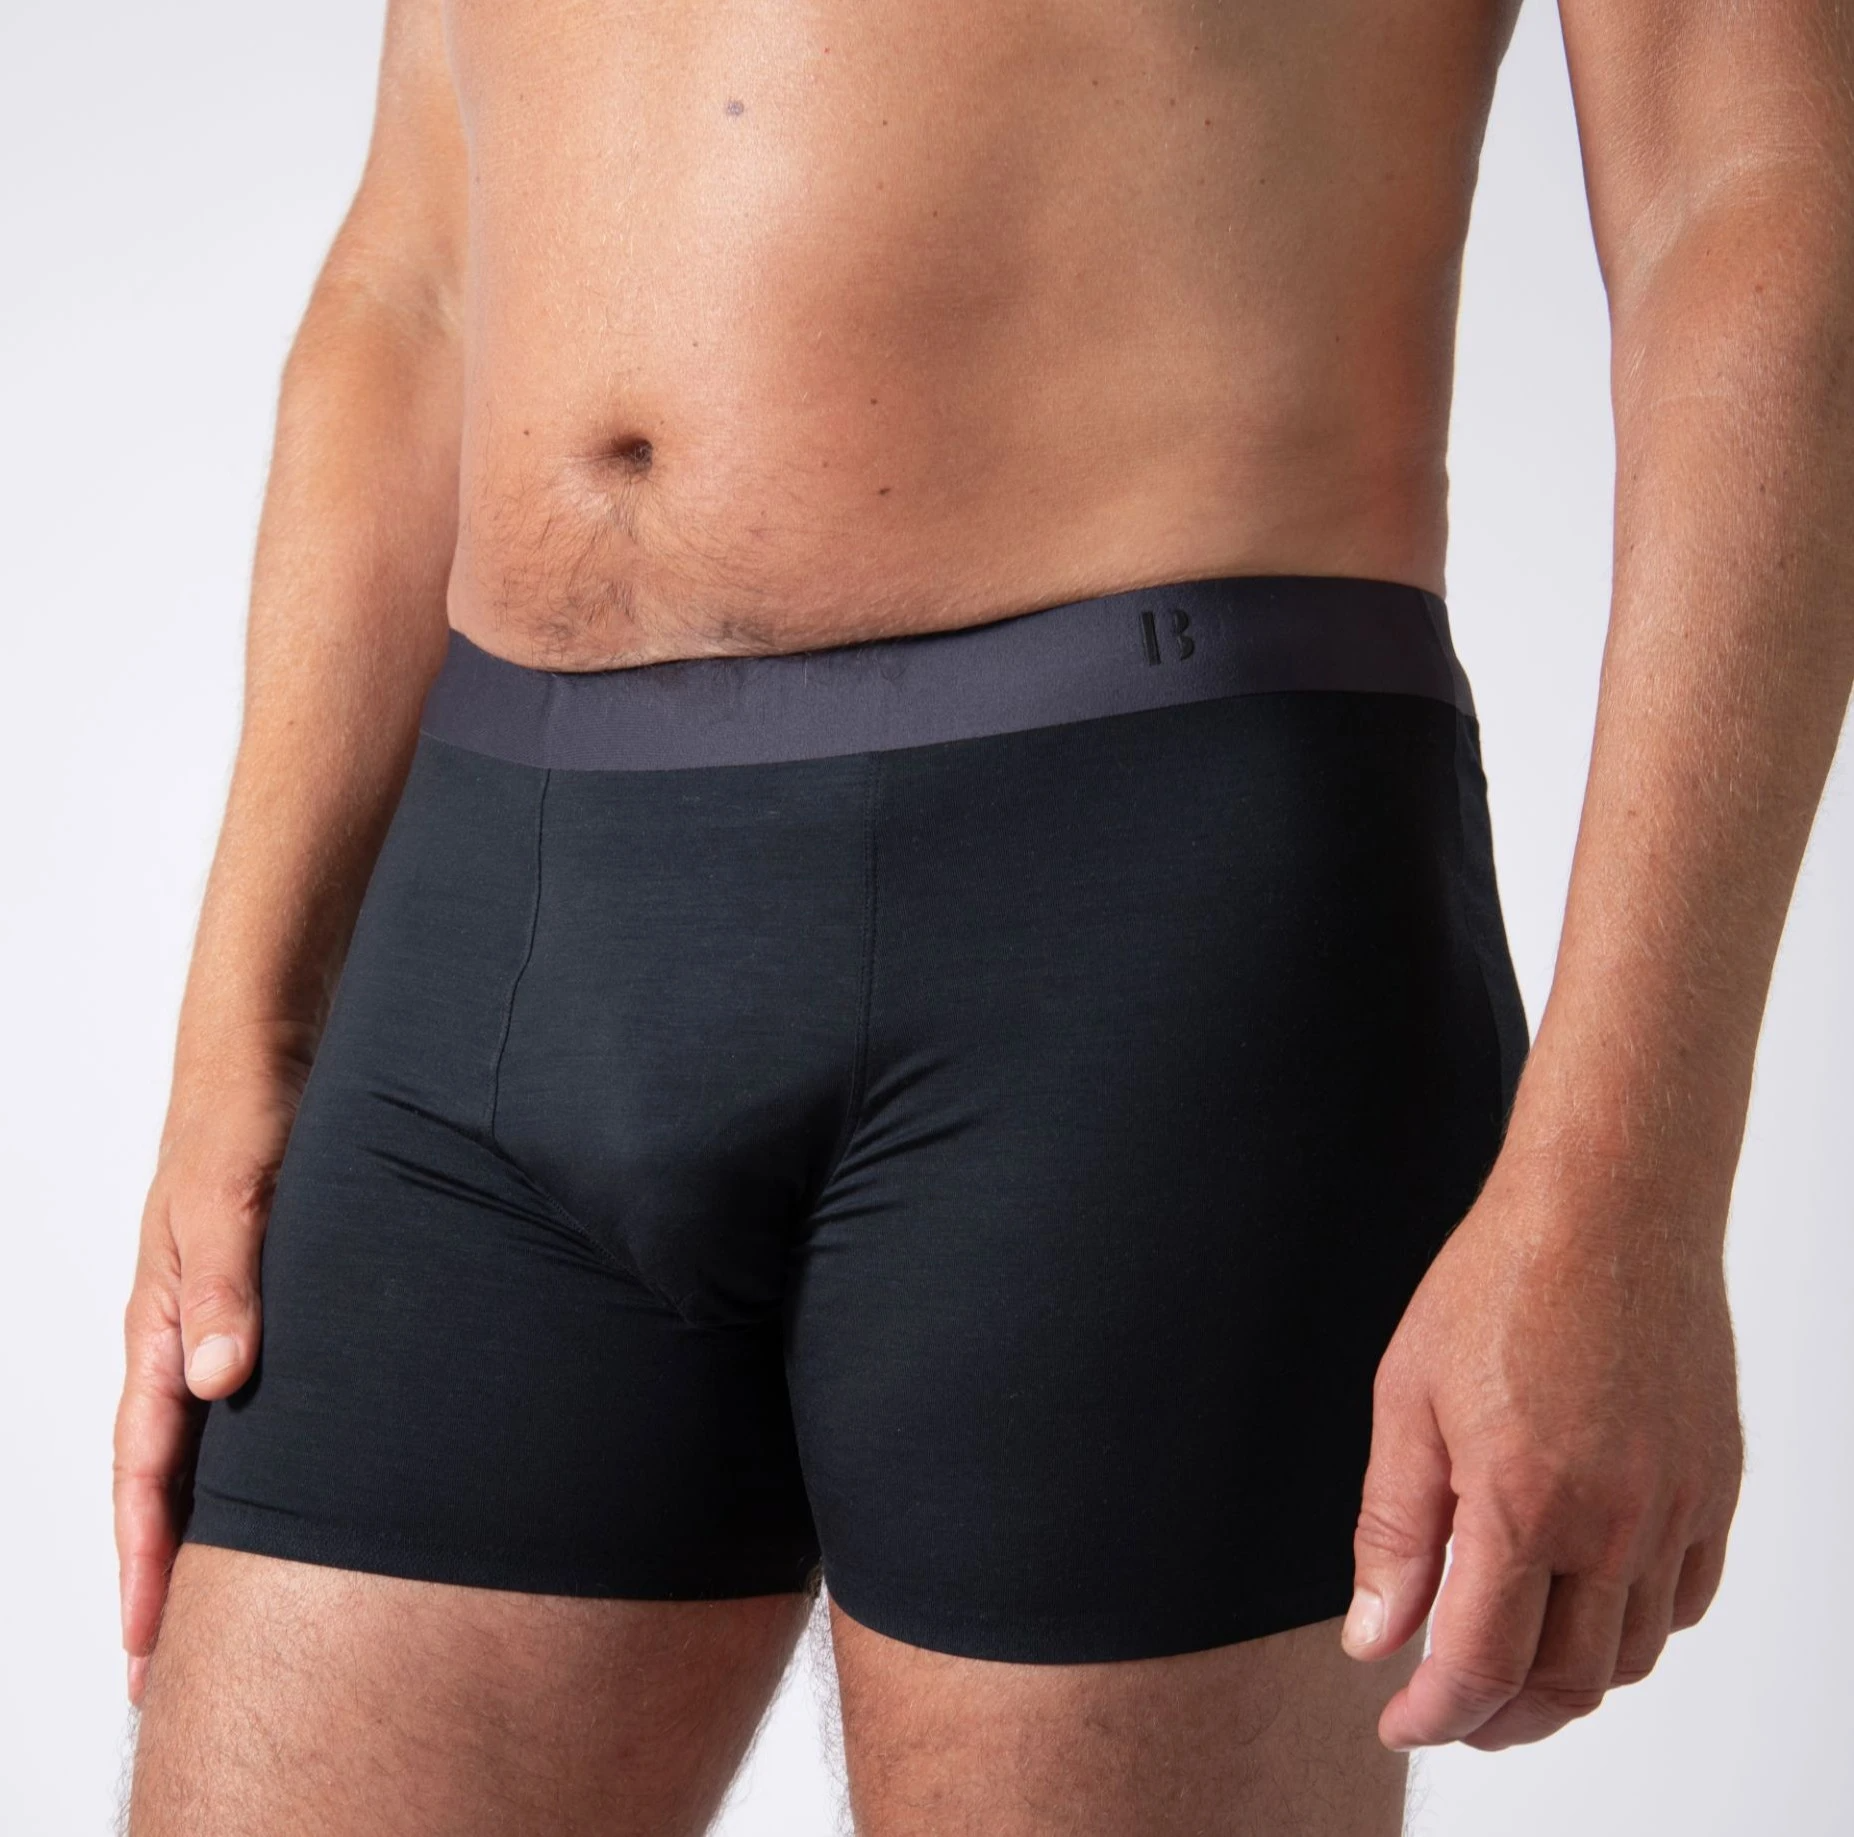 Hvilken type undertøj til din kropsbygning?